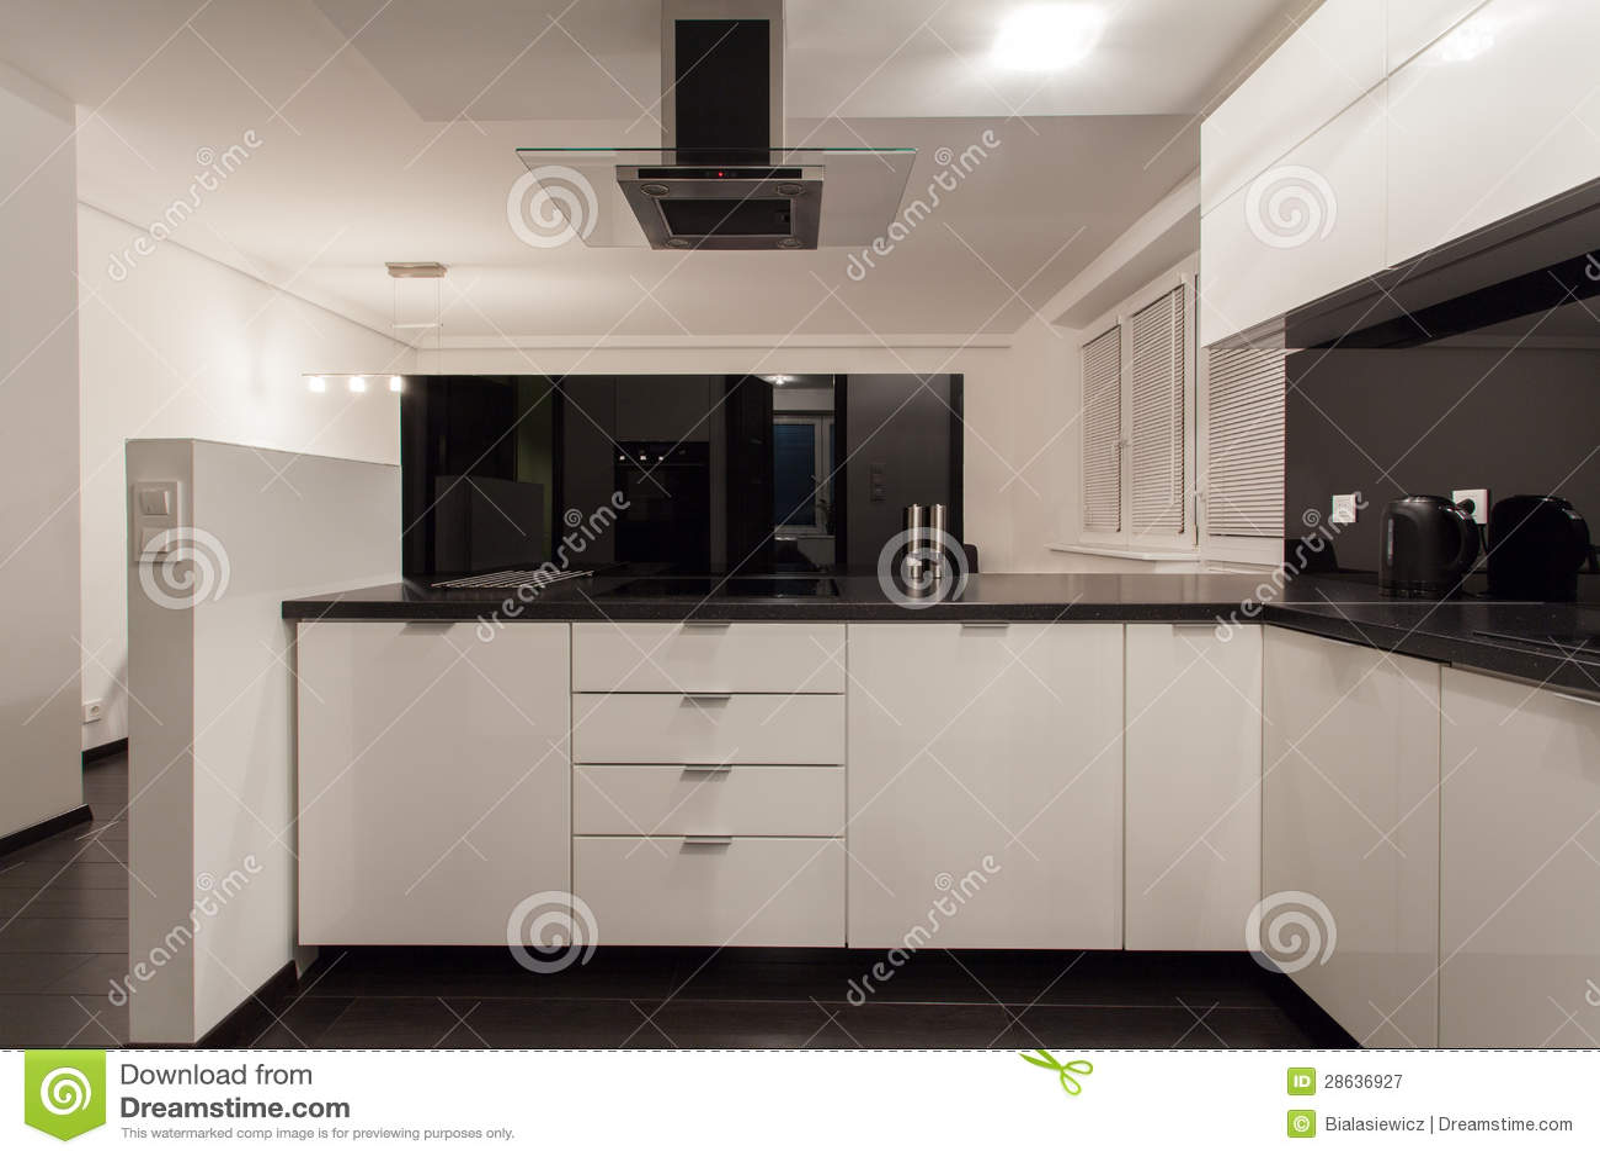 minimalist apartment - small kitchen royalty free stock